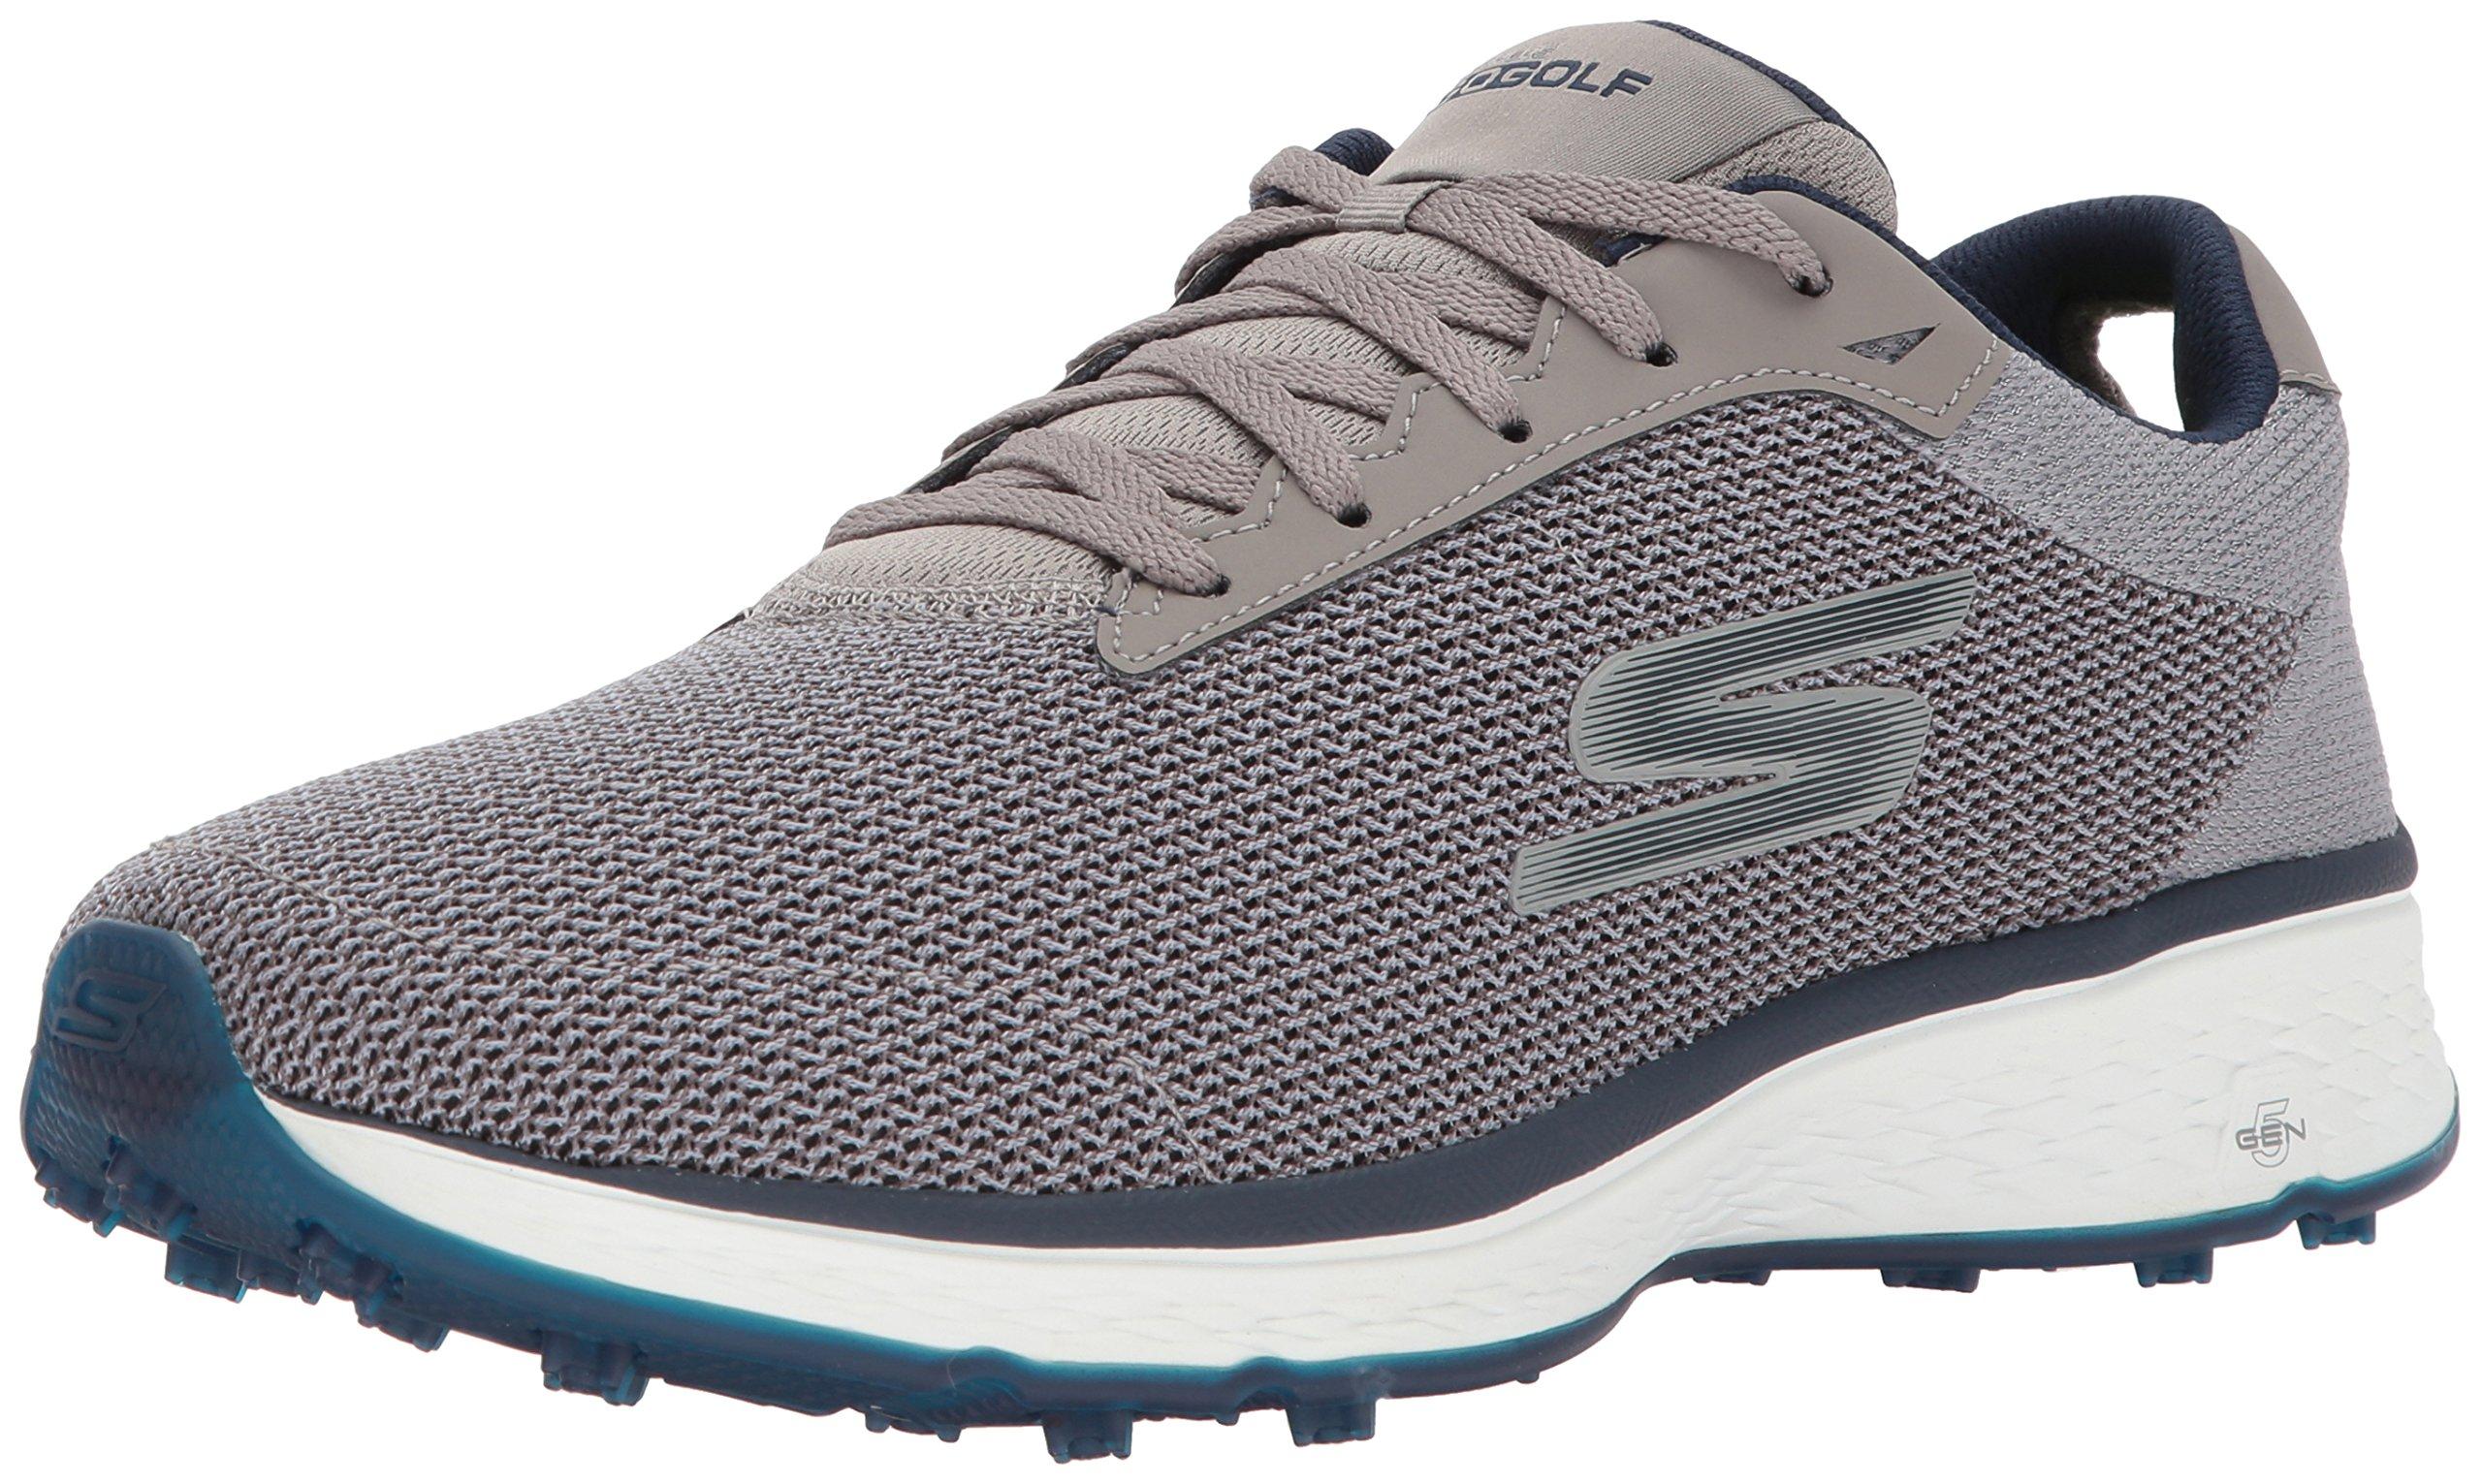 Skechers Golf Men's Go Golf Fairway Golf Shoe, Gray/Navy, 7.5 2E US